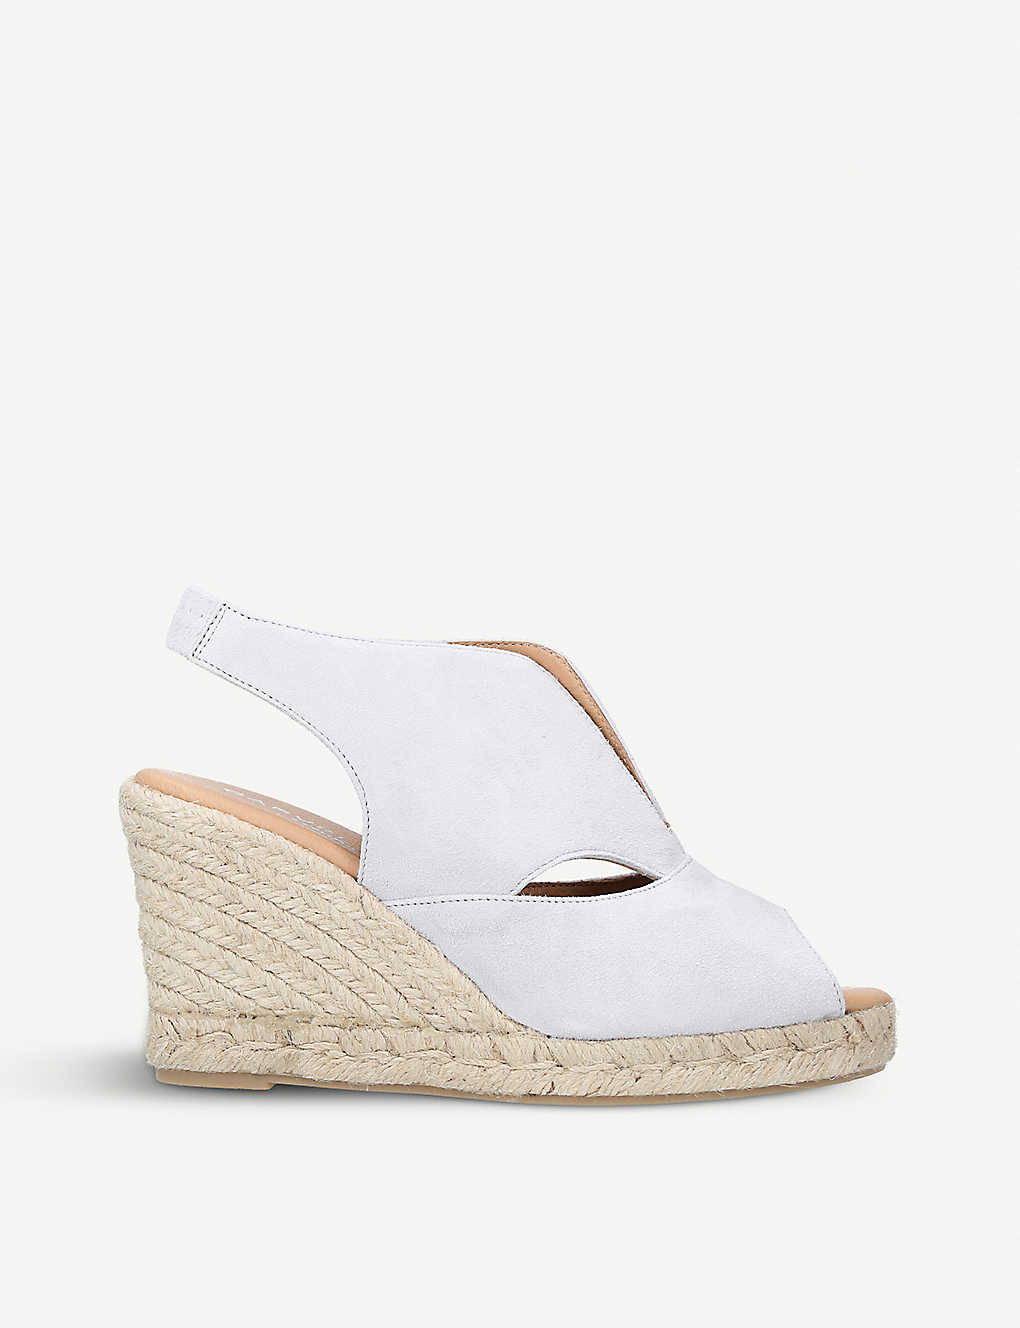 bee1e2a01a25 CARVELA COMFORT - Sara suede espadrille wedge sandals